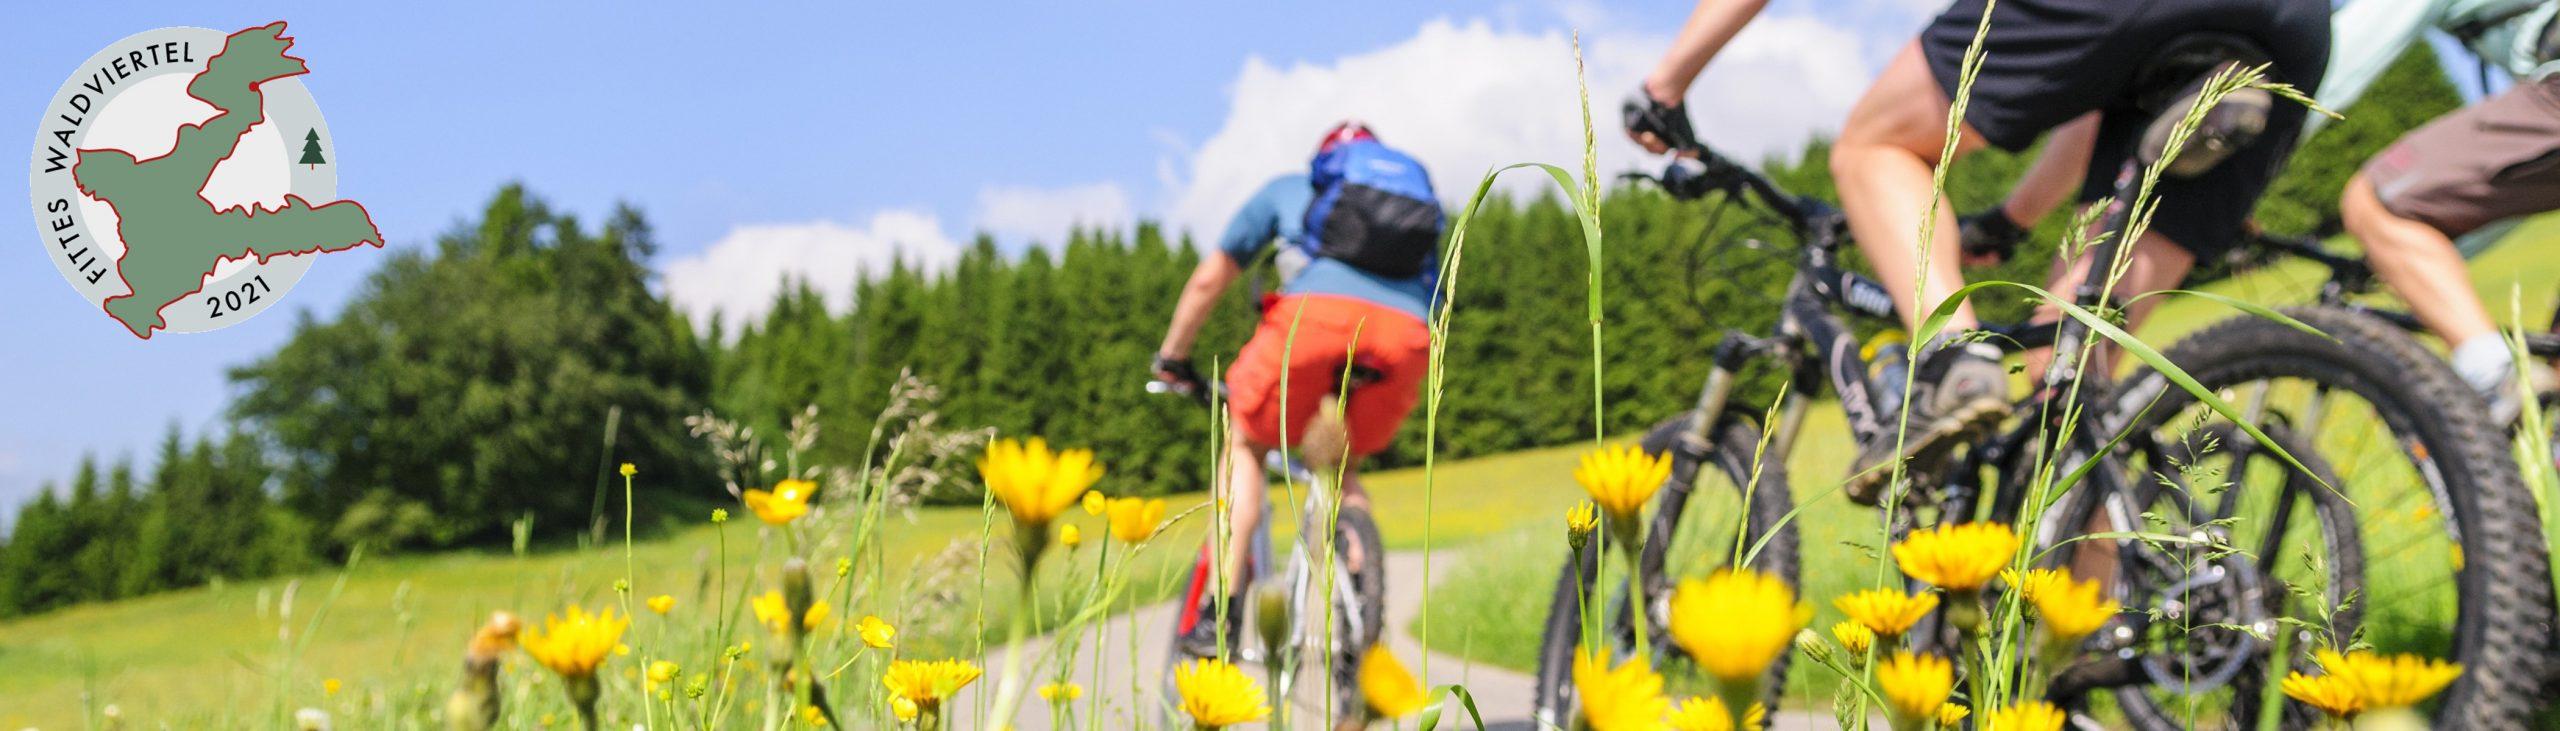 Mountainbike_sehrschmal_LOGO